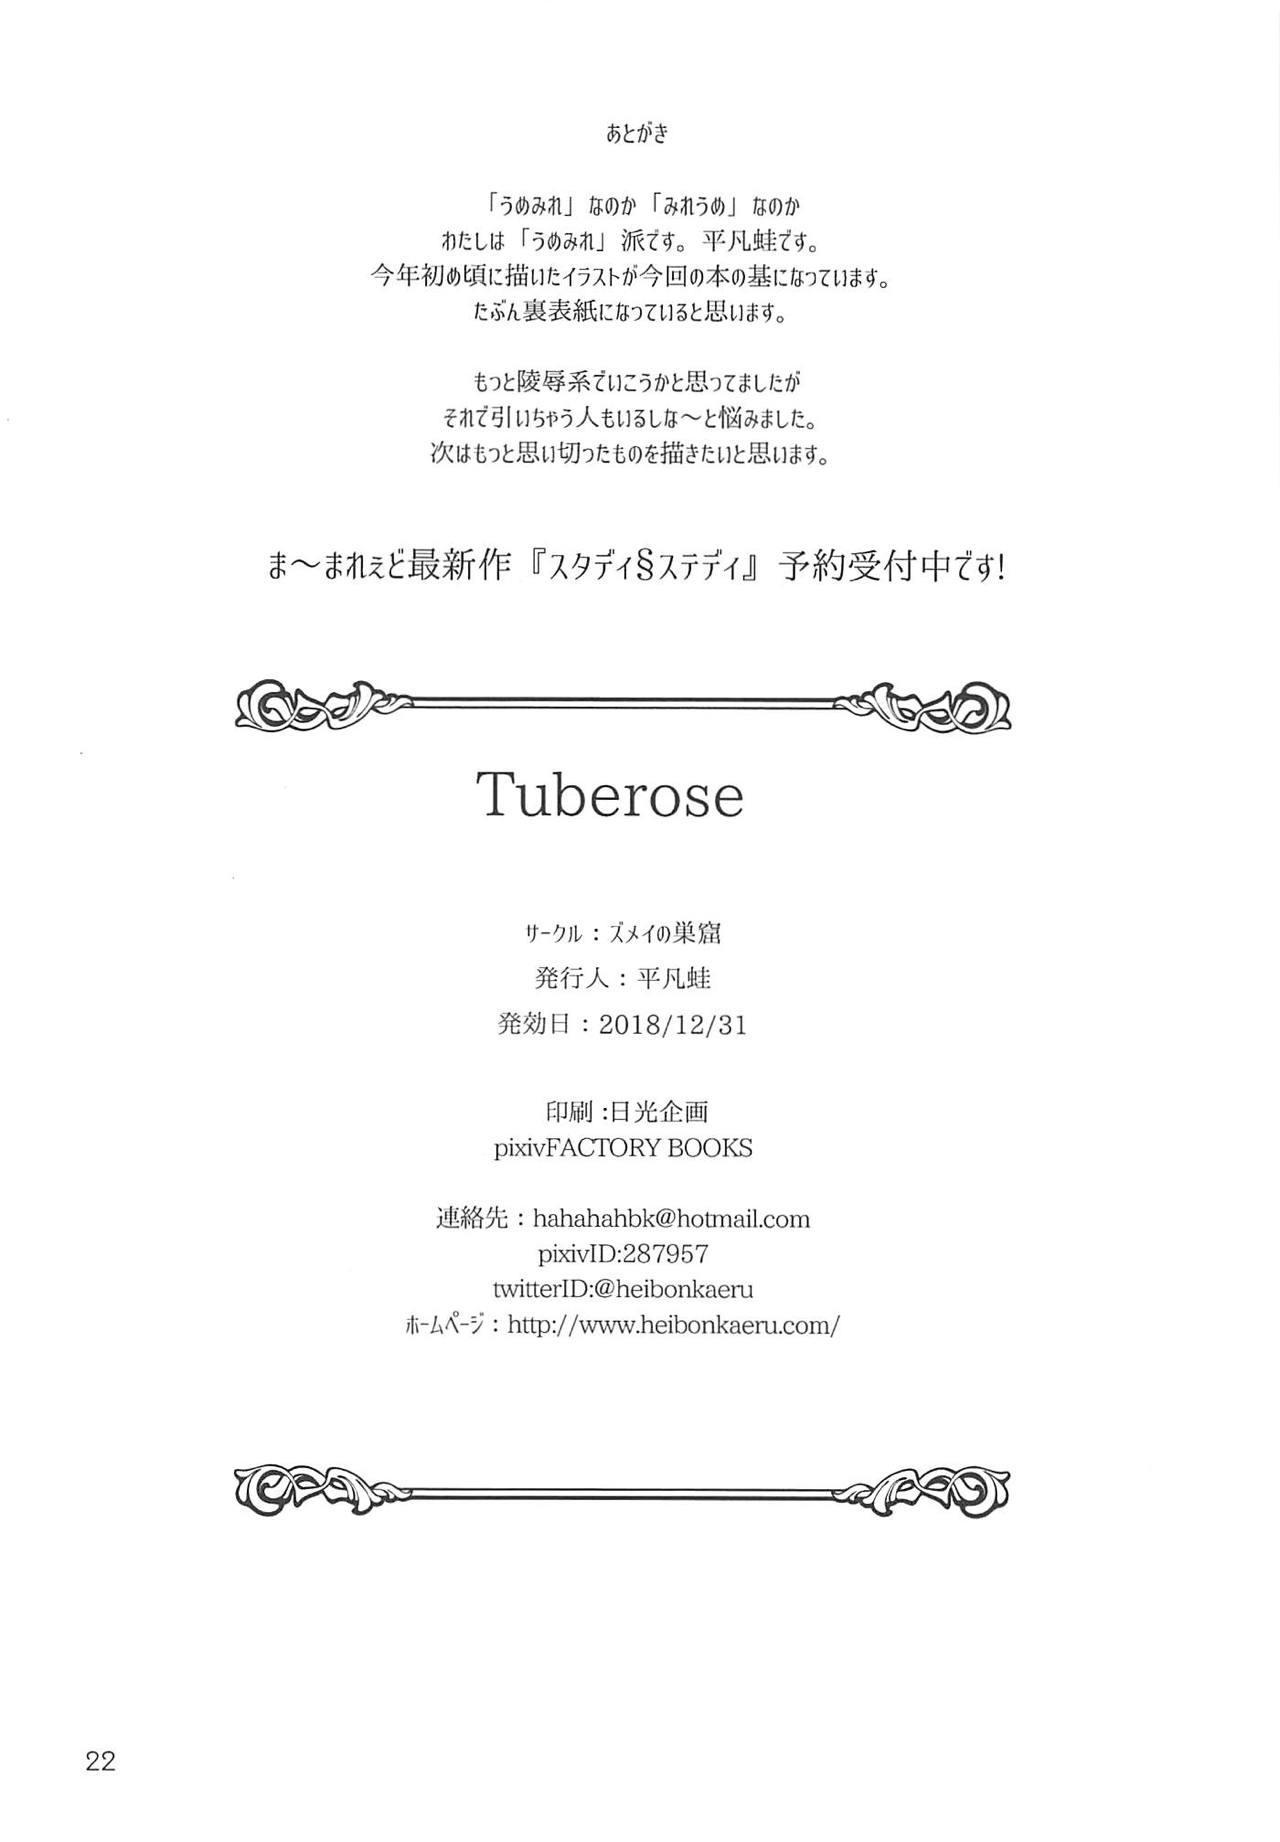 TUBEROSE 20